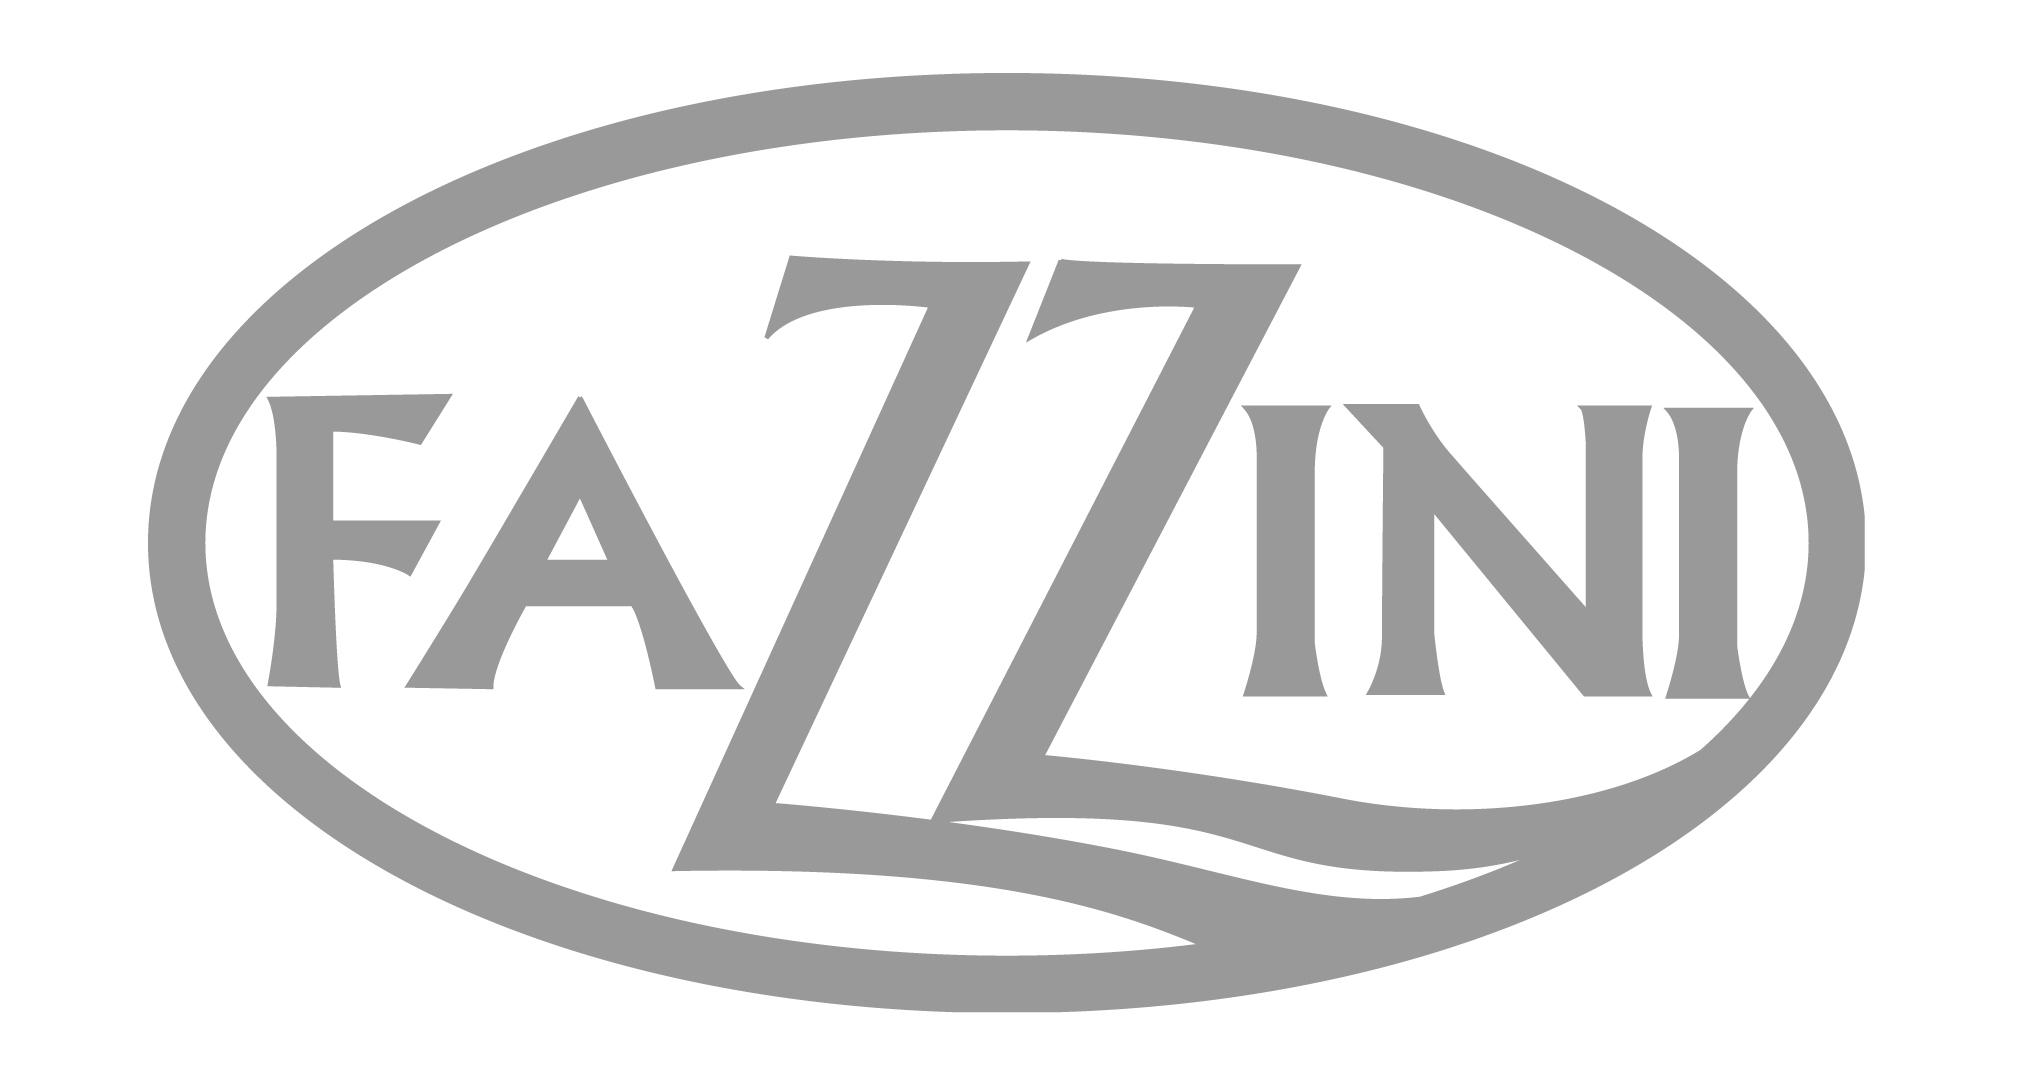 fazzini_logo.jpg